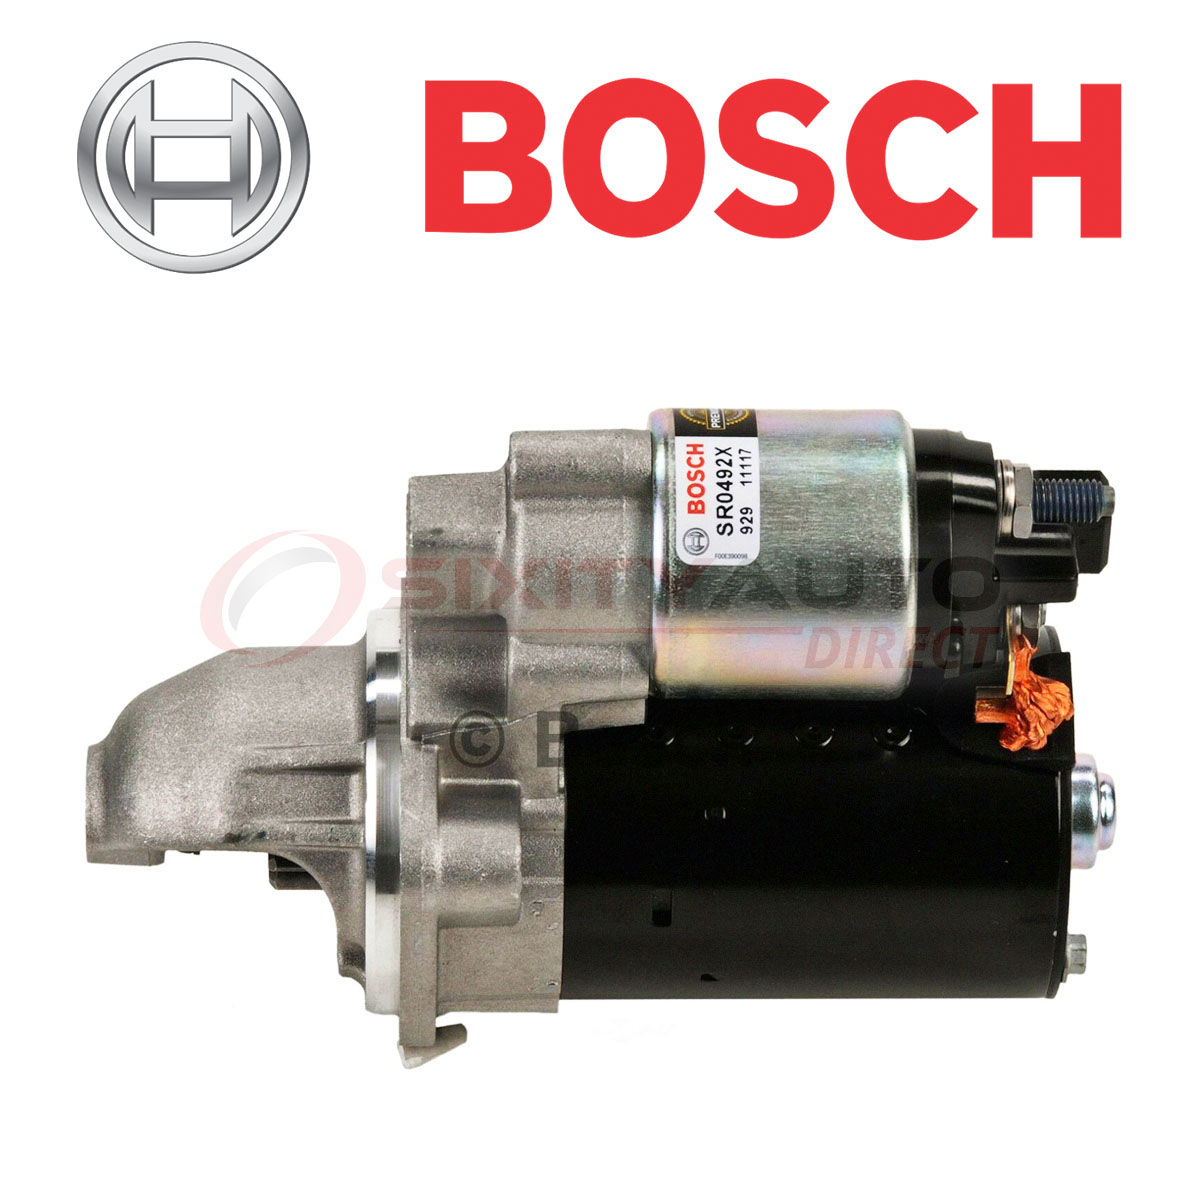 Bosch Starter Motor For 2009-2011 BMW 328i XDrive 3.0L L6